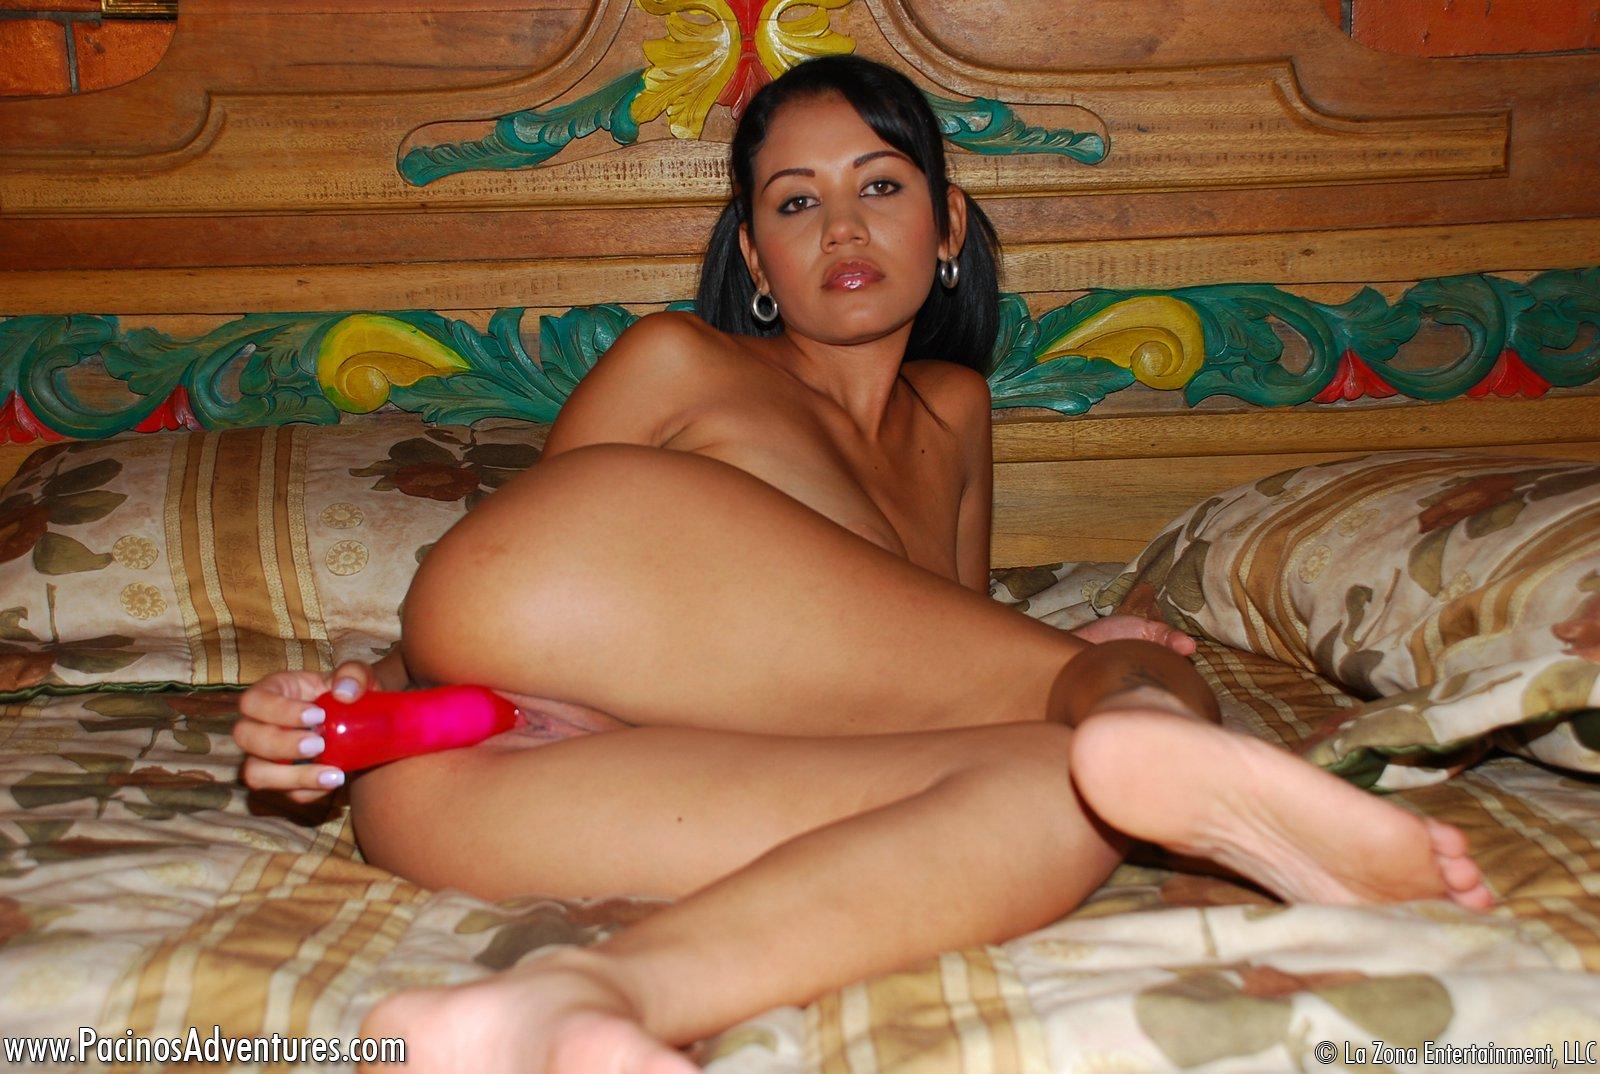 debby ryan having naked sex